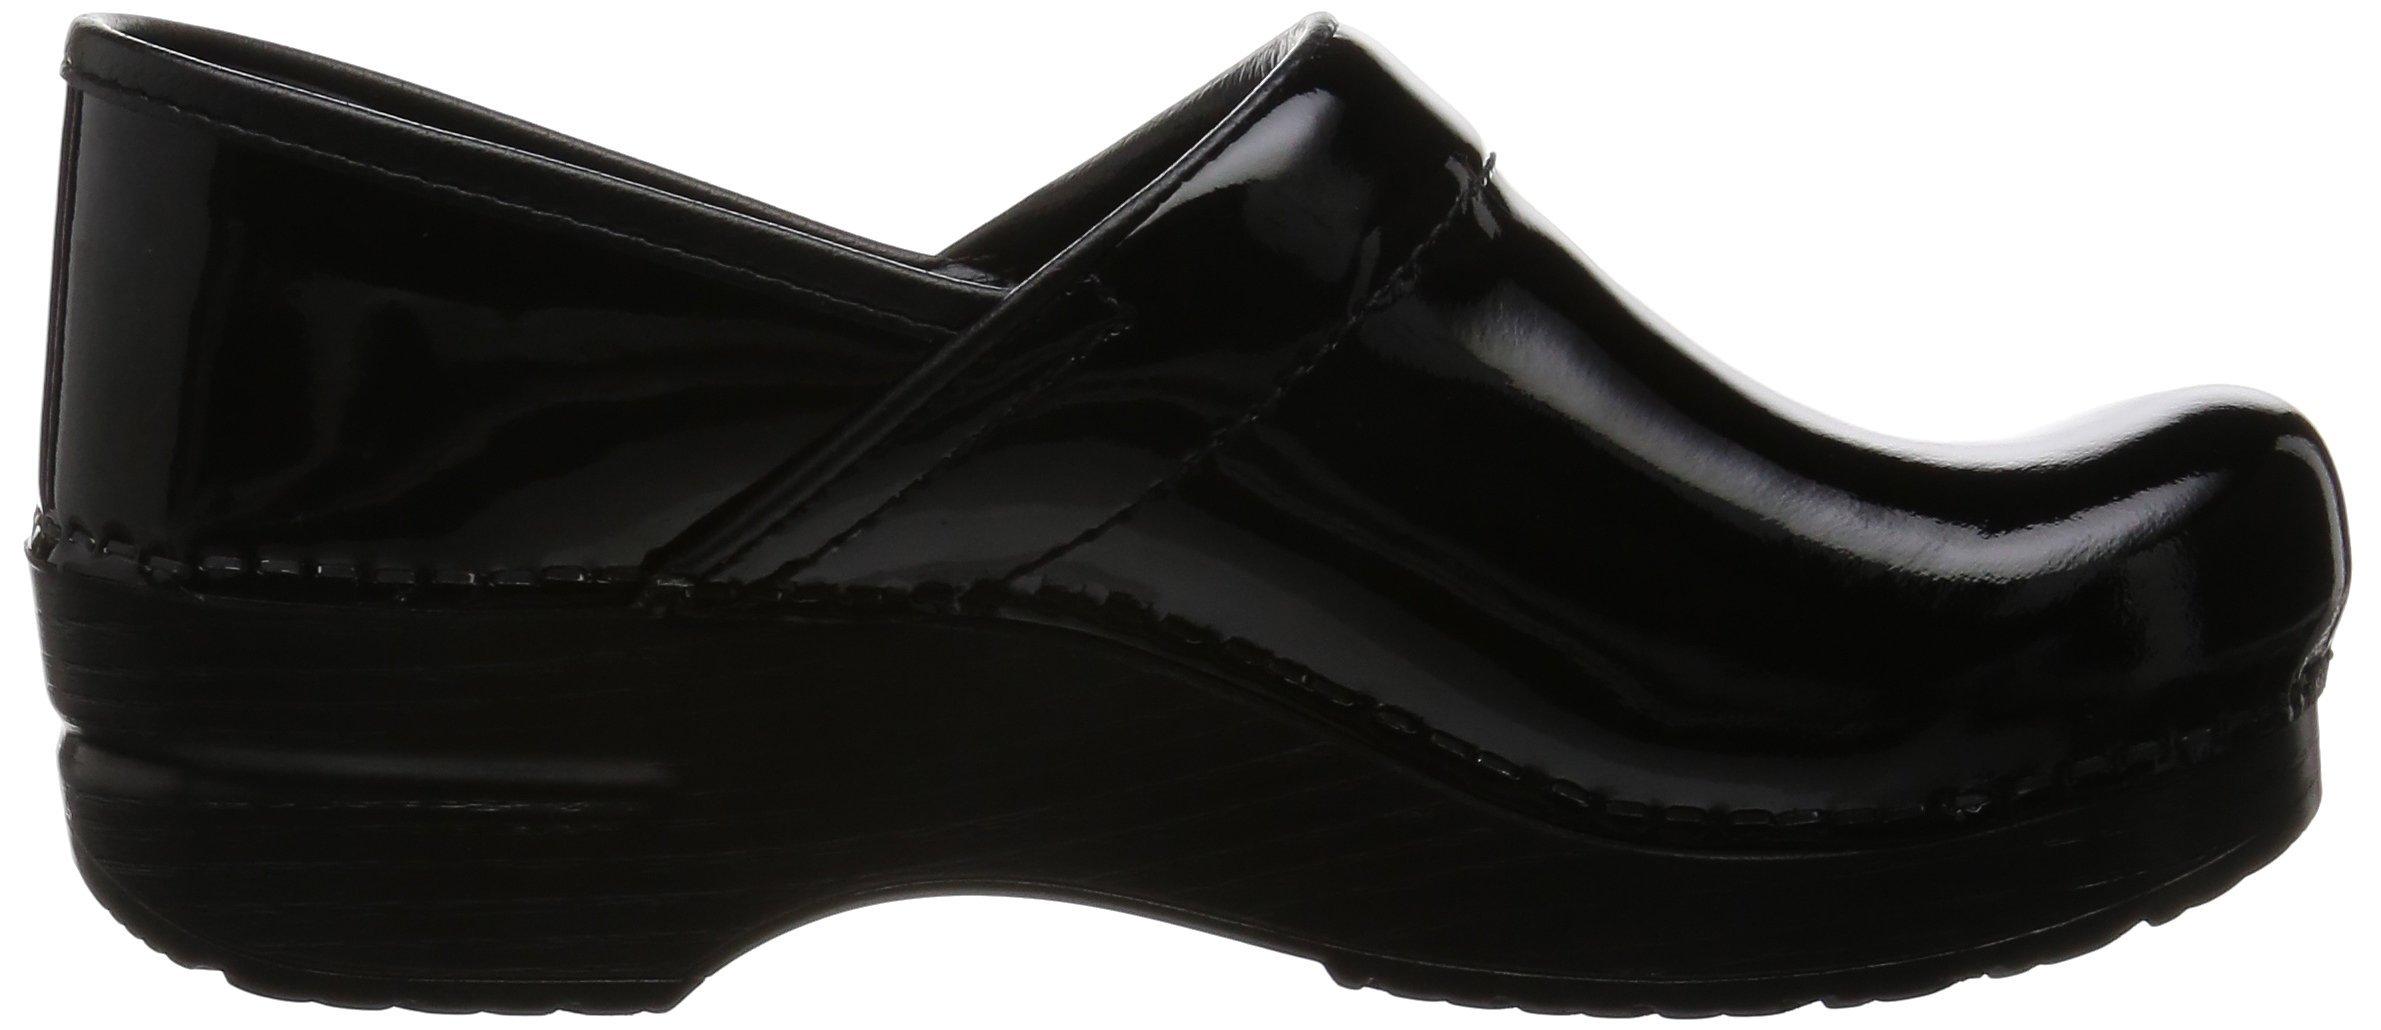 Dansko Women's Professional Patent Leather Clog,Black Patent,37 EU / 6.5-7 B(M) US by Dansko (Image #8)